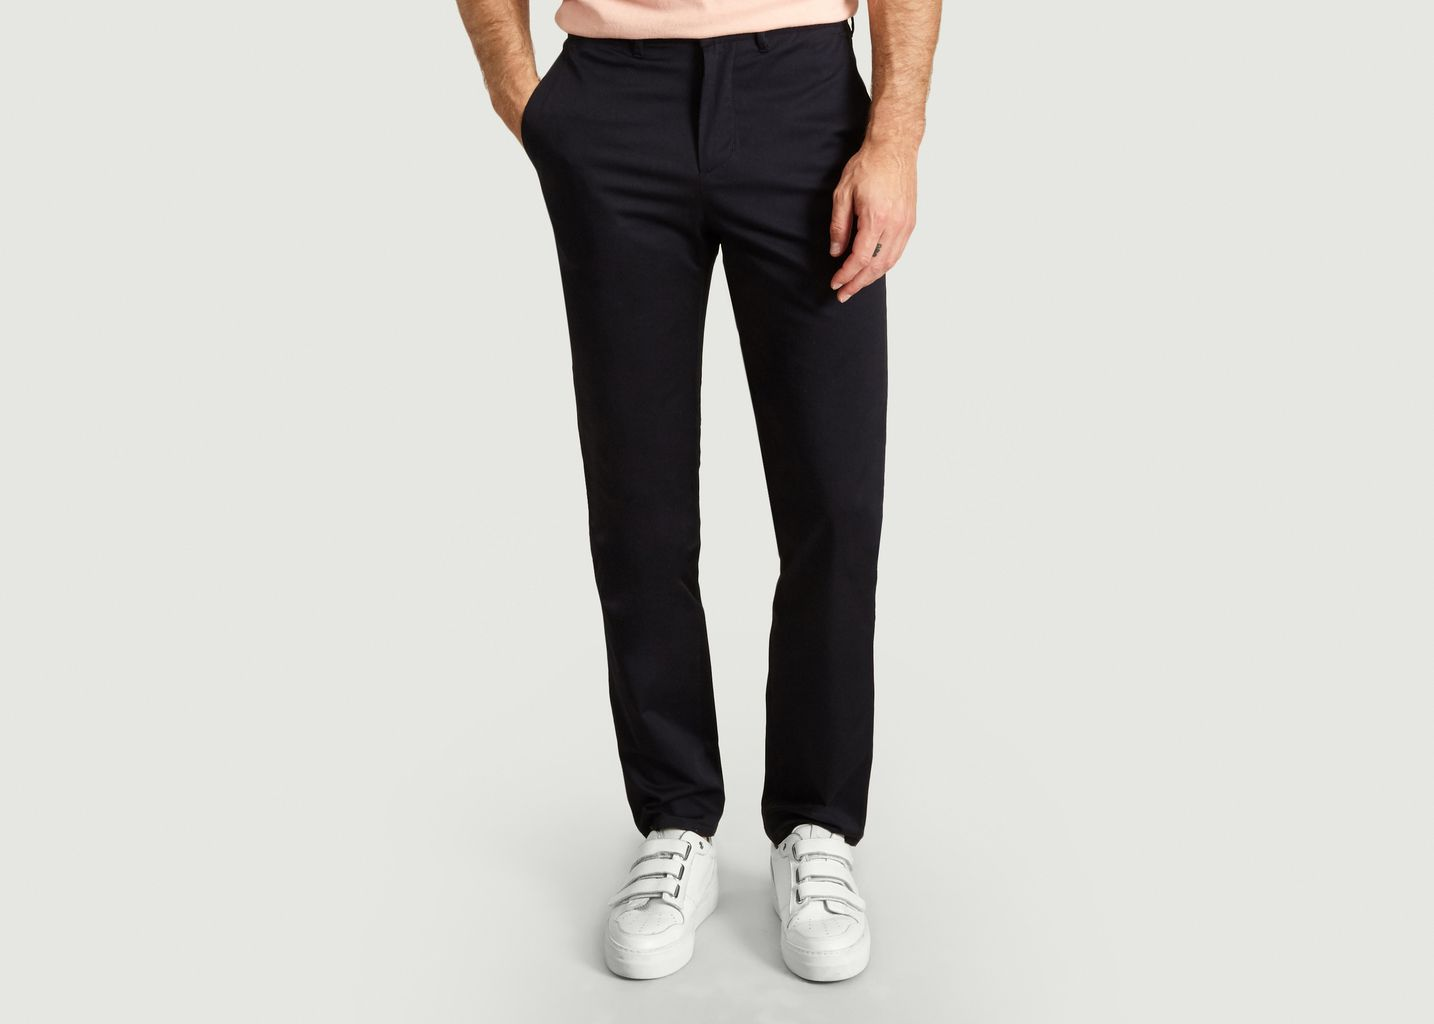 Pantalon Regular - Loreak Mendian